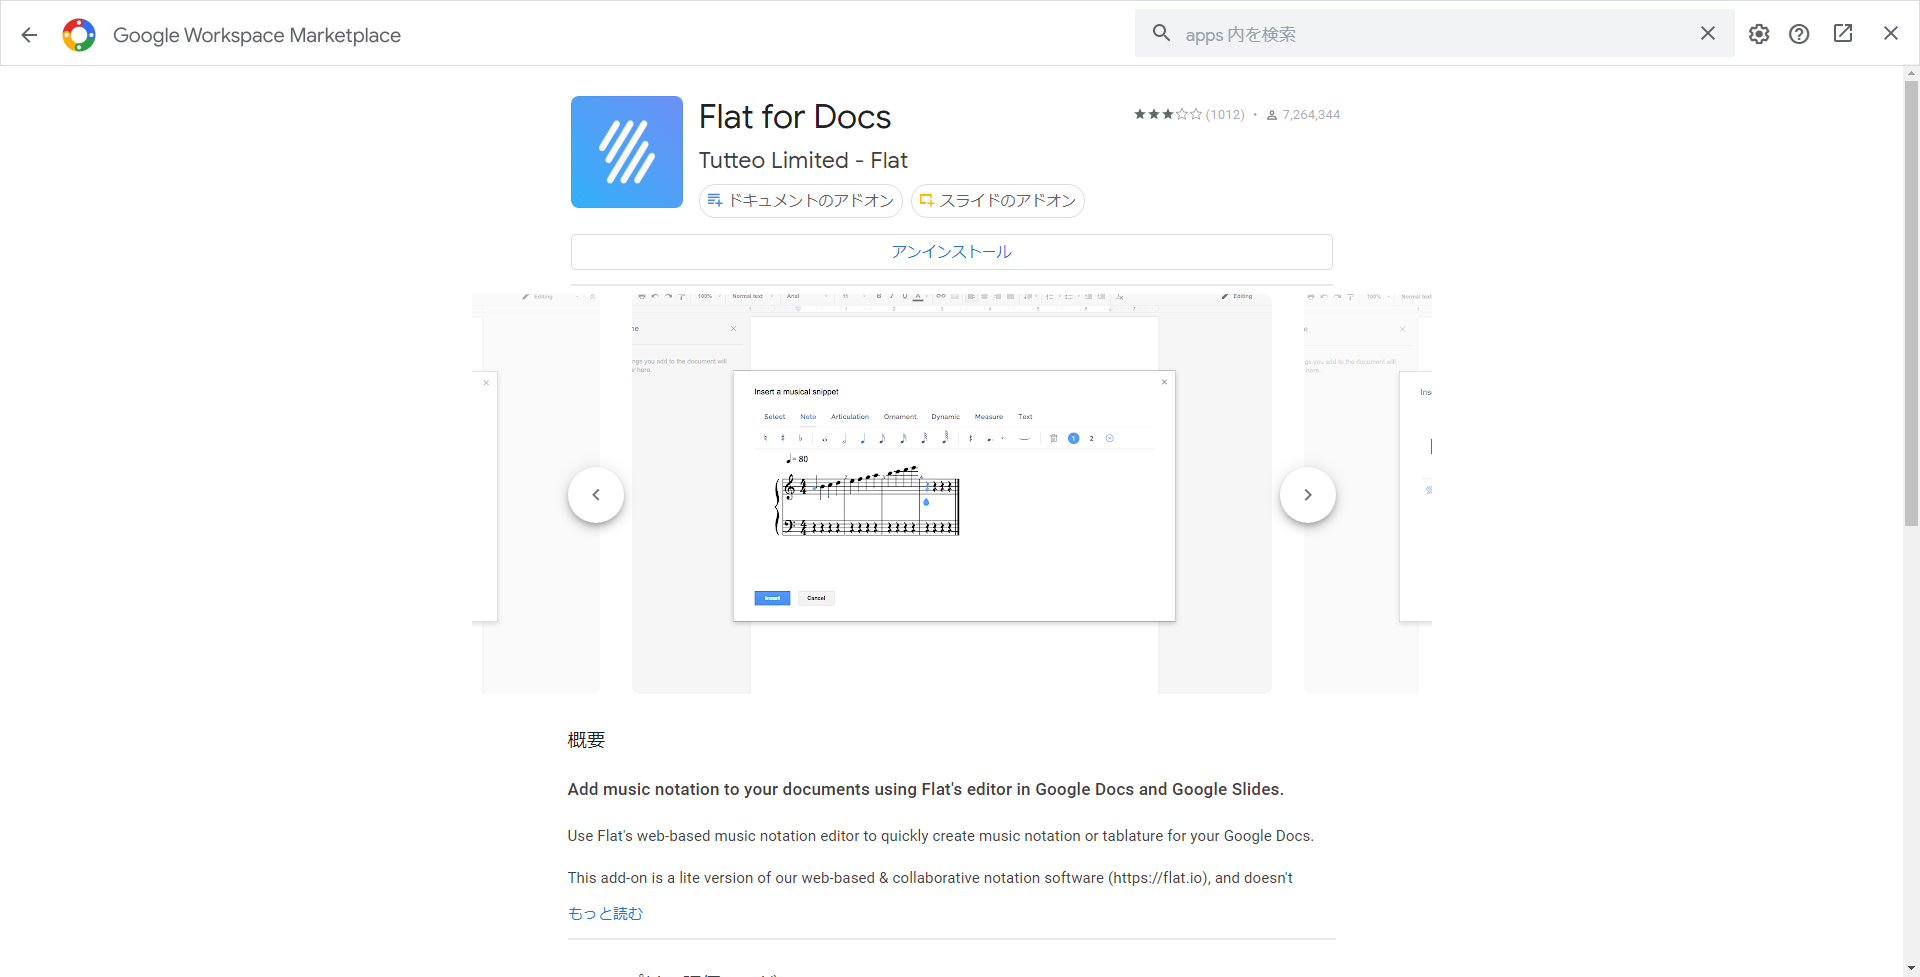 Flat for Docsのダウンロードページ